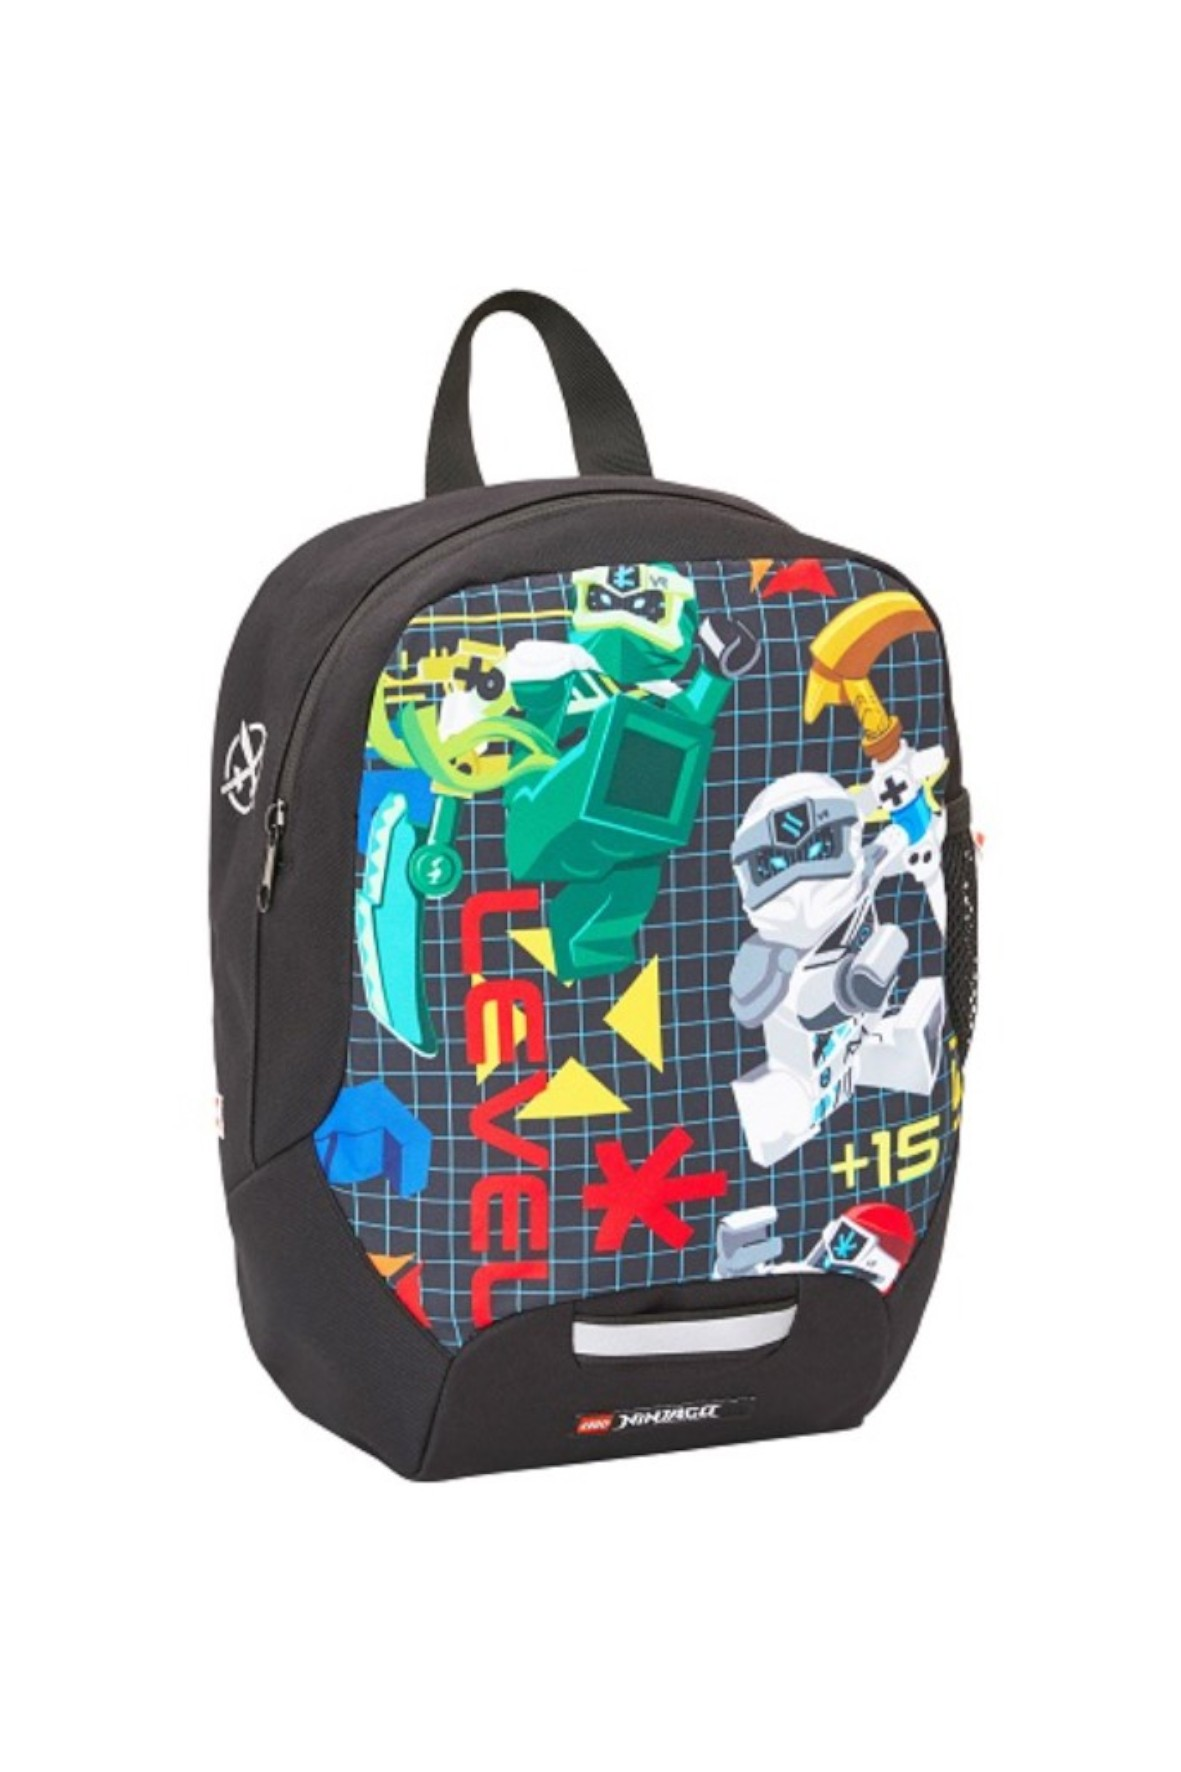 Plecak chłopięcy Ninjago Prime